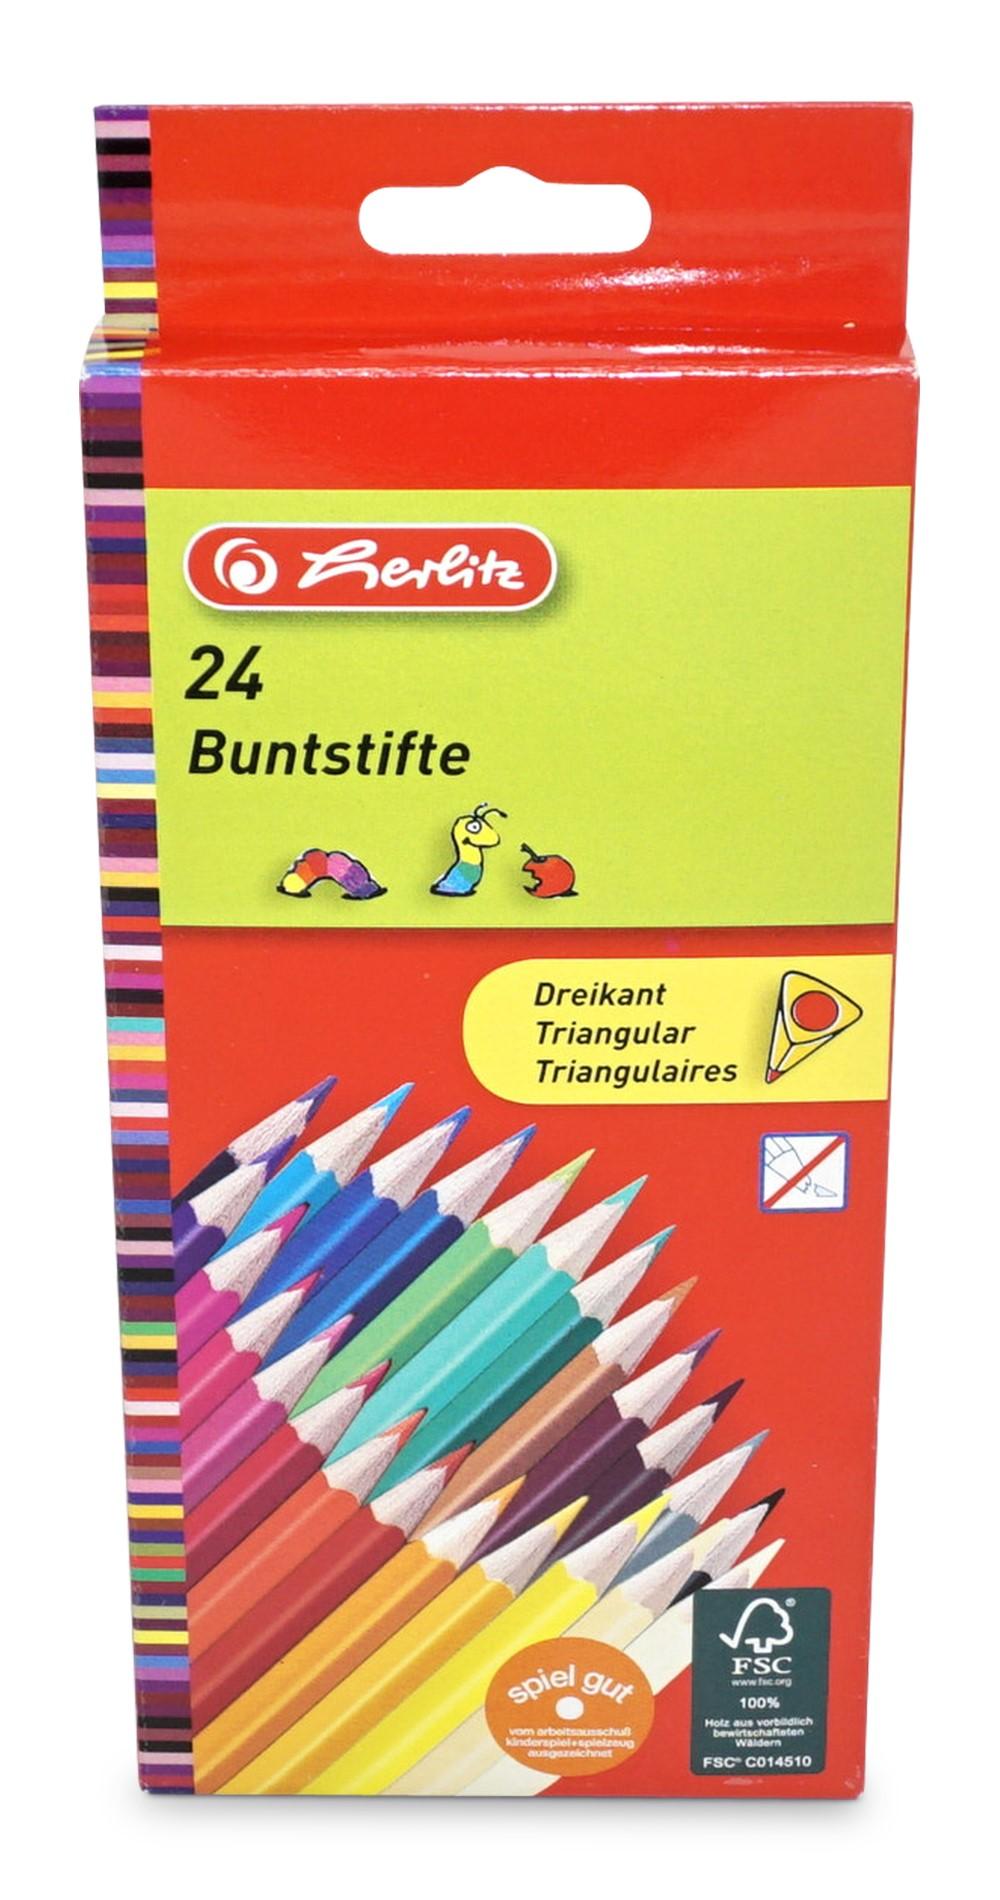 Herlitz  Buntstifte dreikant, 24er-Packung